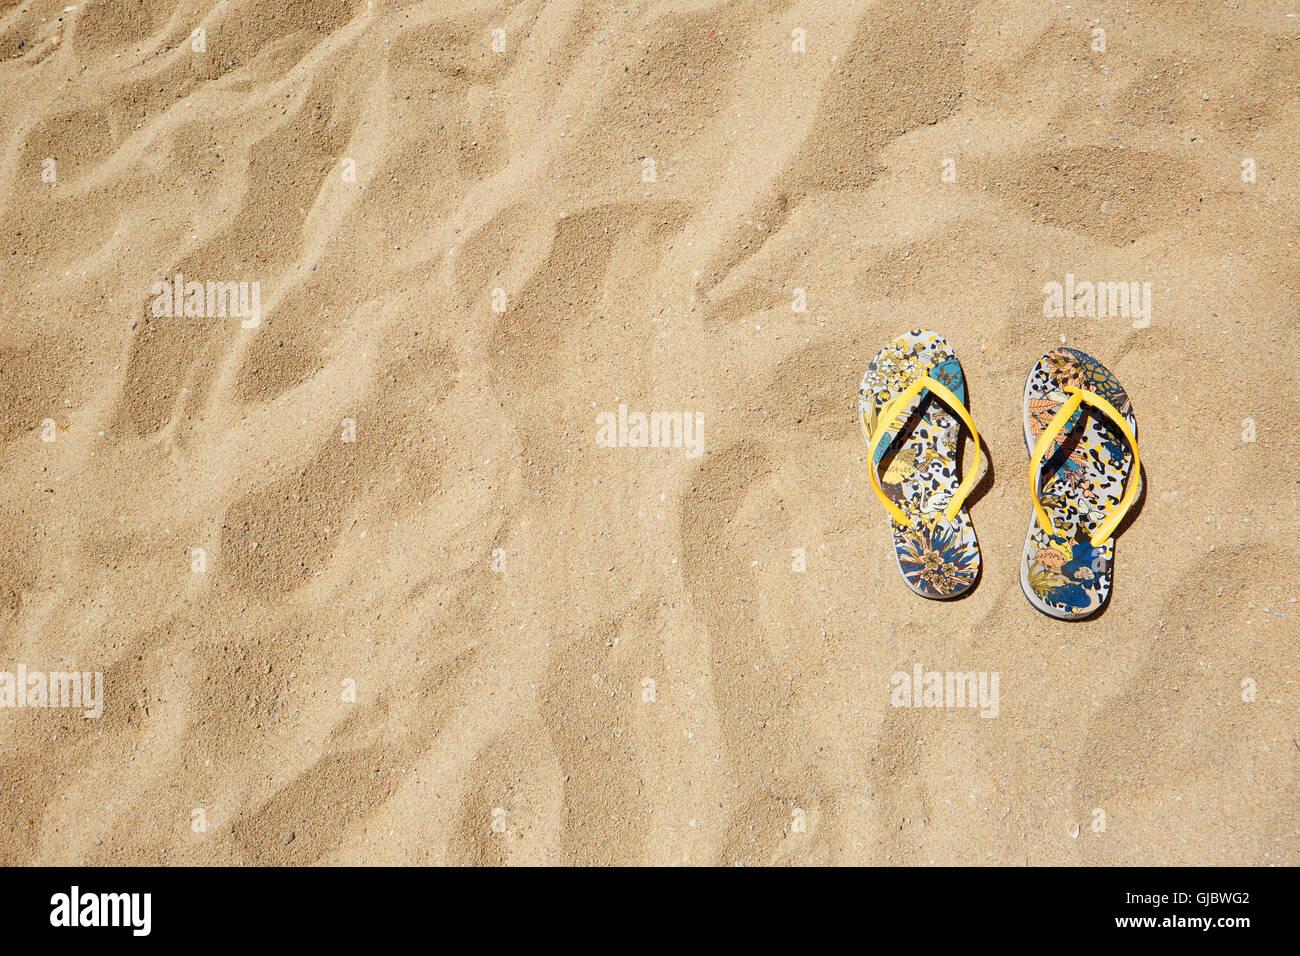 Closeup Beach Sandals Flip Flops or Tongs Sandy  Background Copyspace. Summer Concept. Horizontal. No body photo. - Stock Image